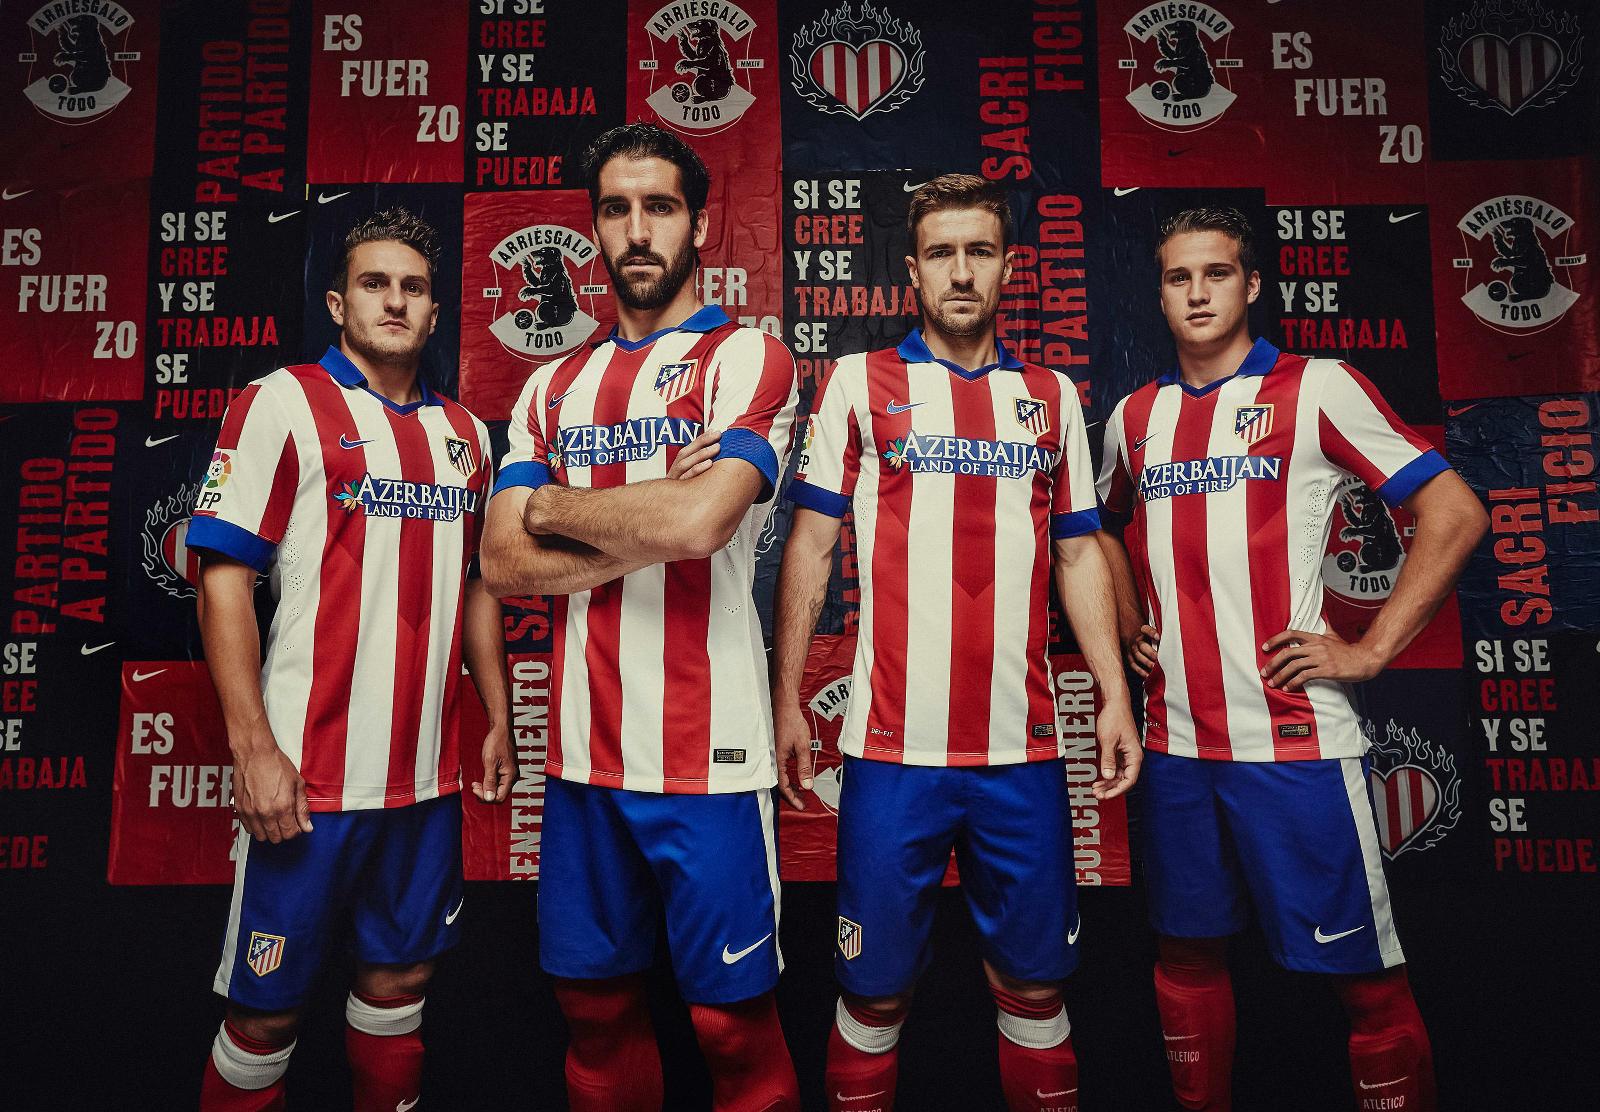 atletico madrid - photo #44